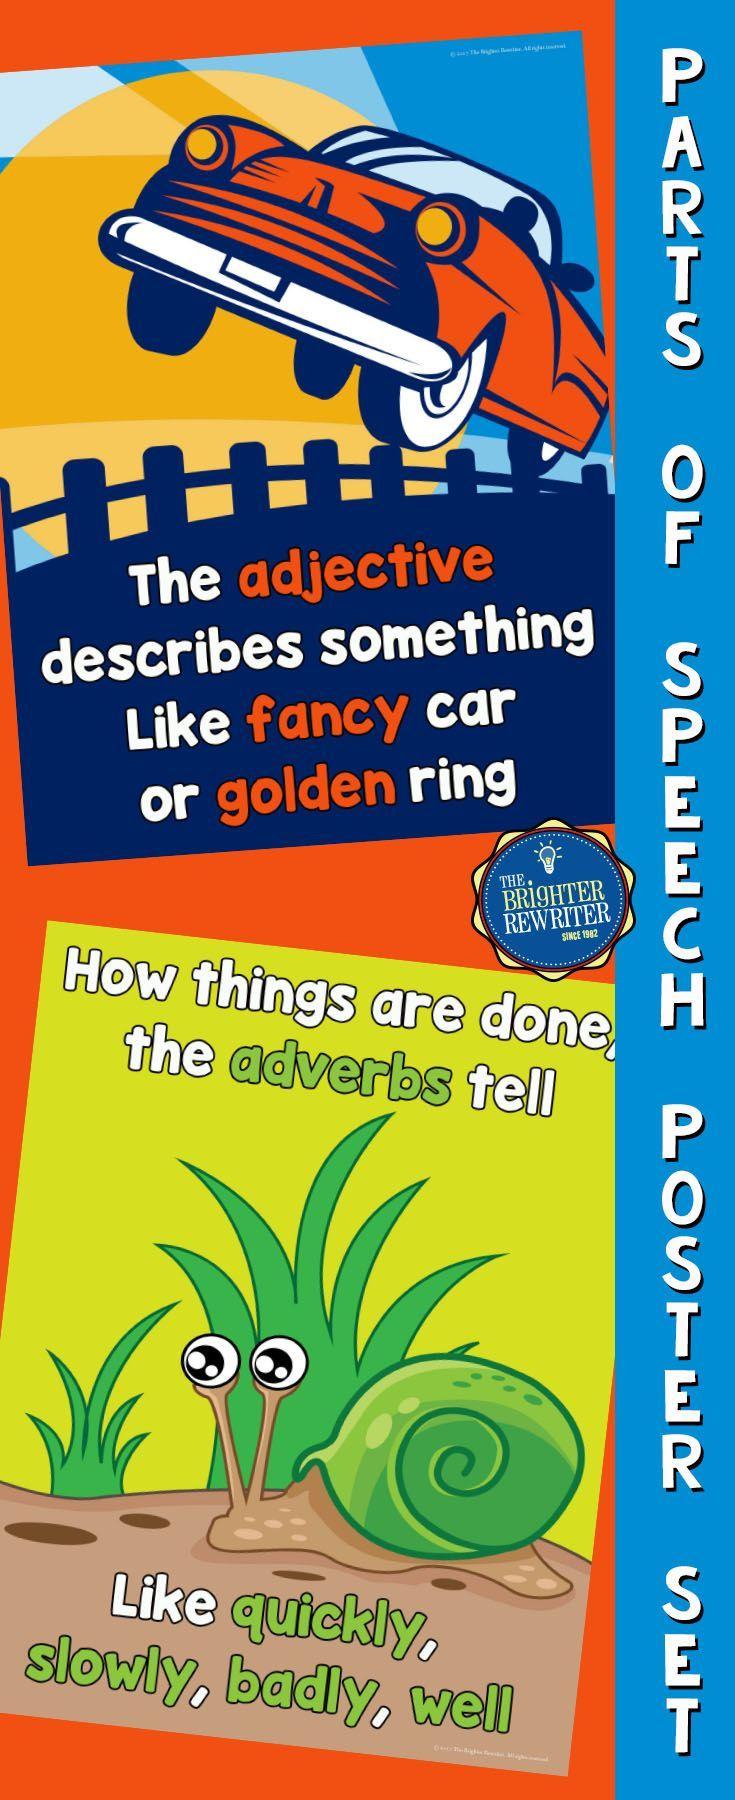 Parts Of Speech Posters Nouns Pronouns Parts Of Speech Adverbs